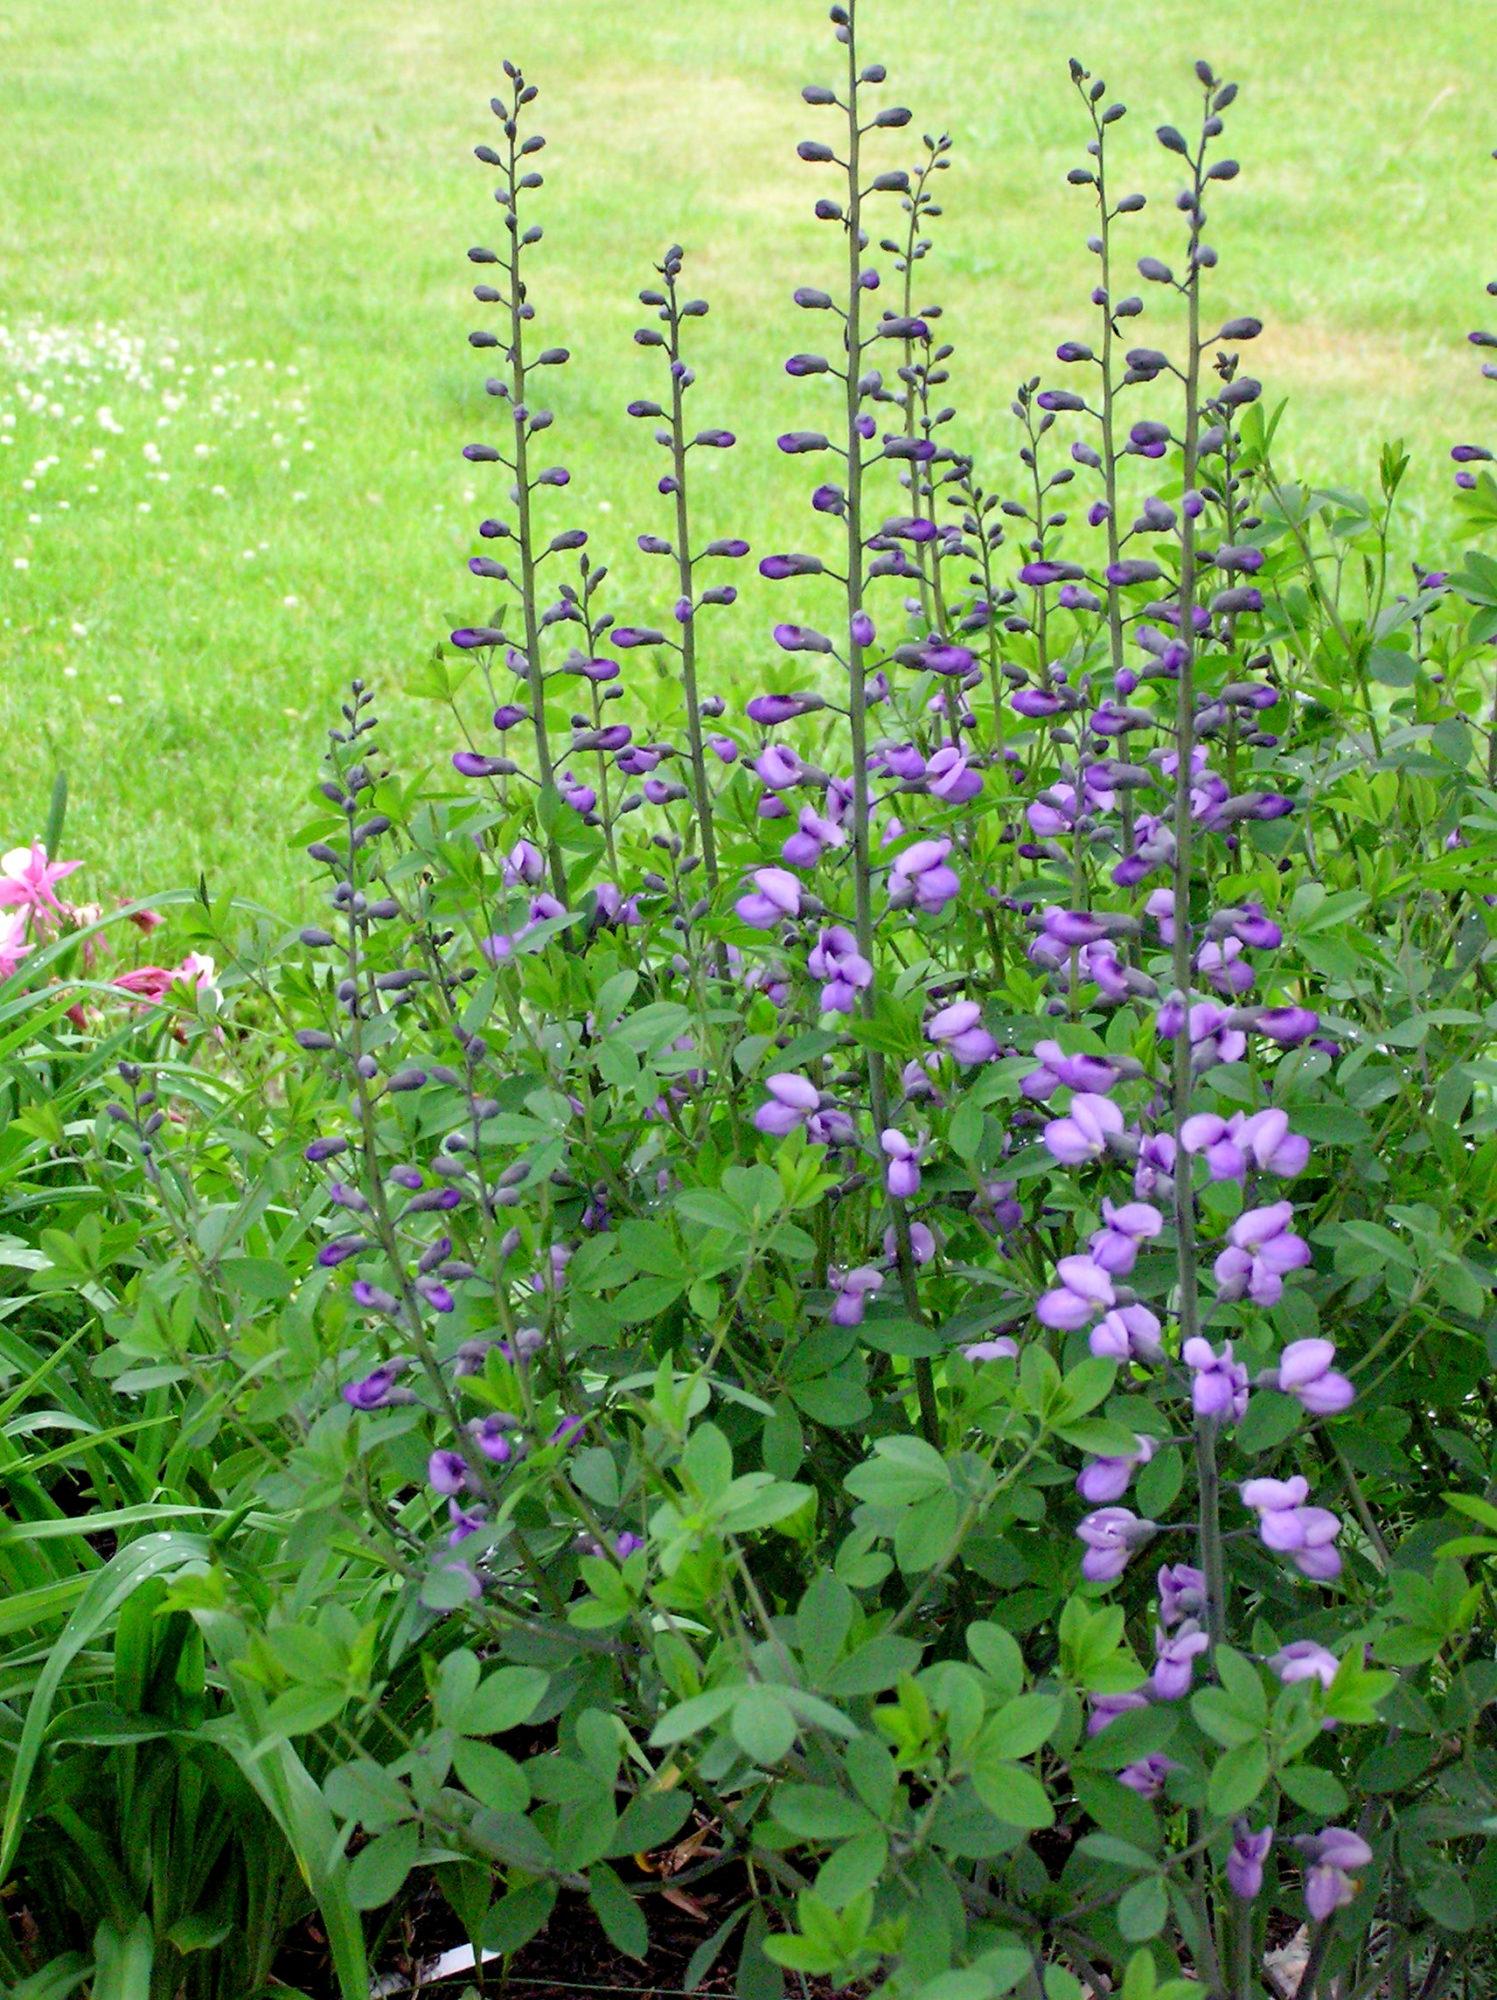 Purple smoke Baptisia, also called false indigo